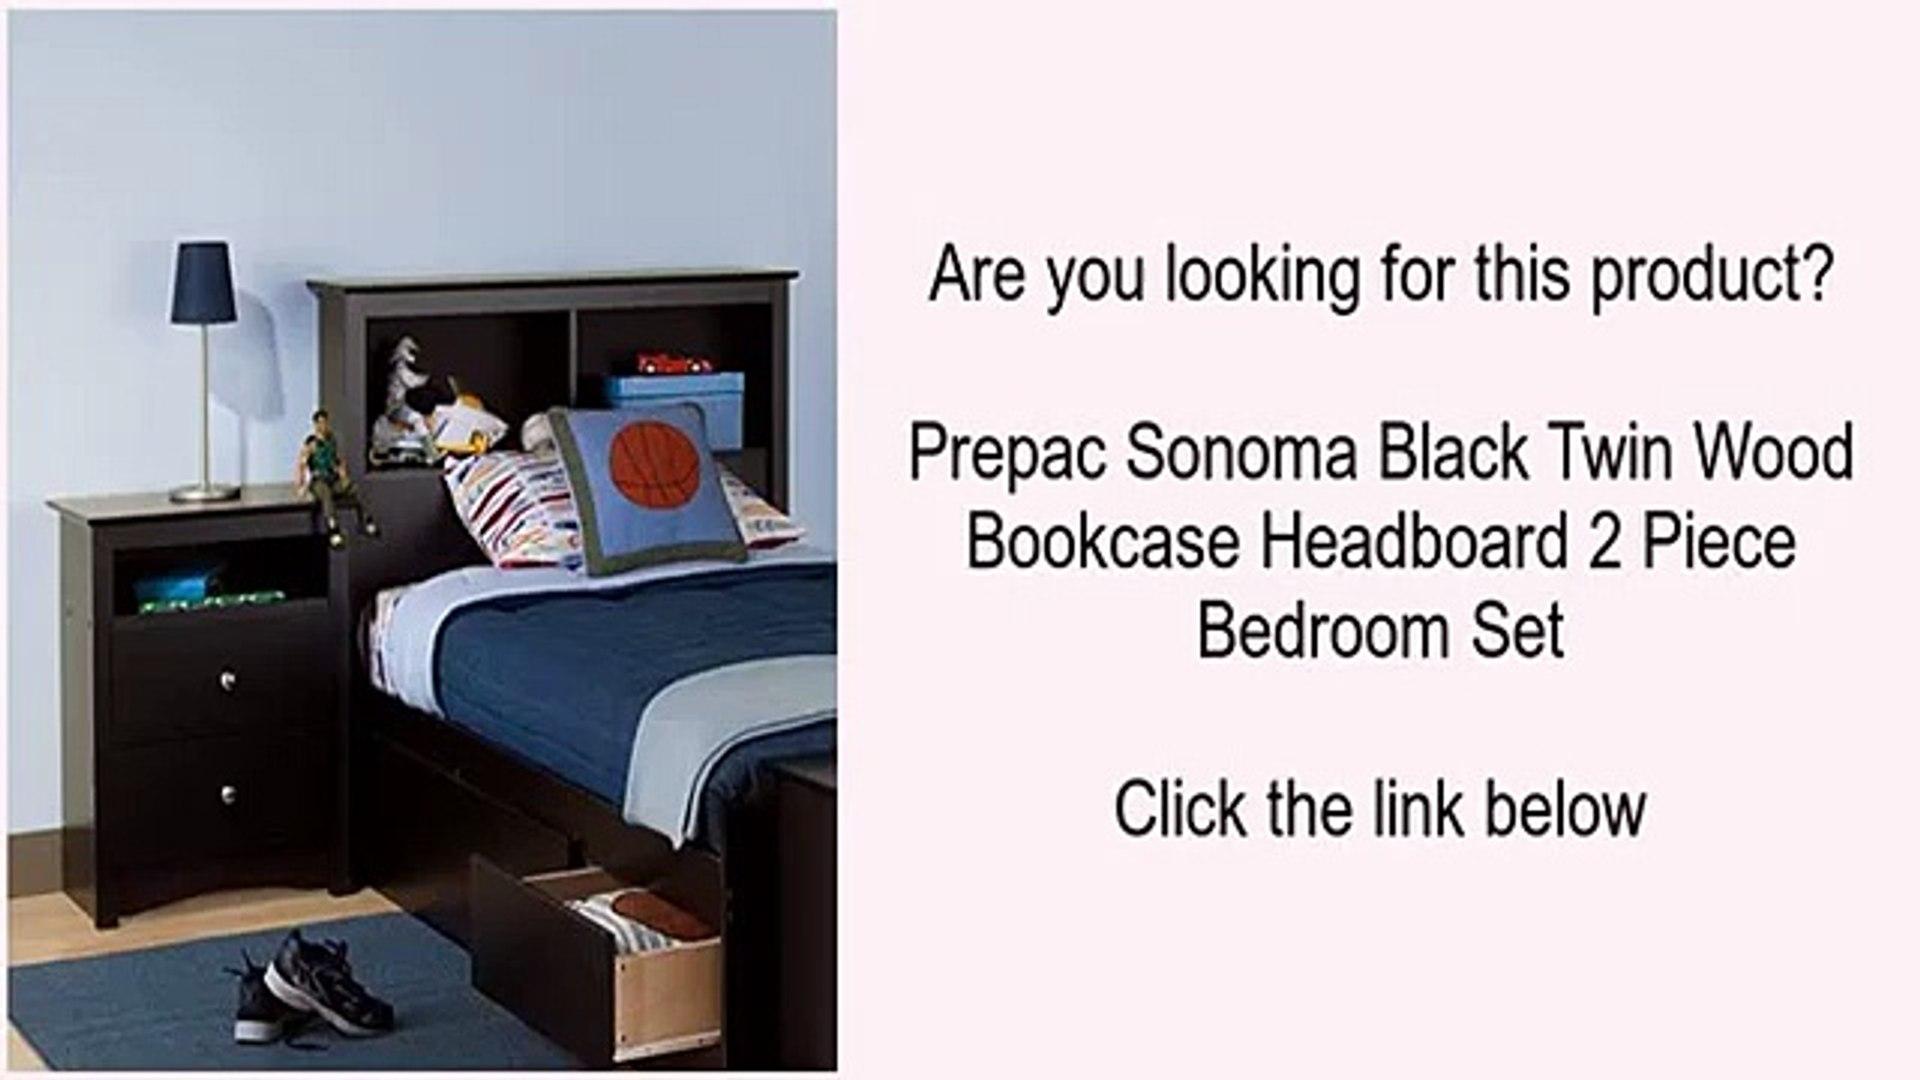 Prepac Sonoma Black Twin Wood Bookcase Headboard 2 Piece